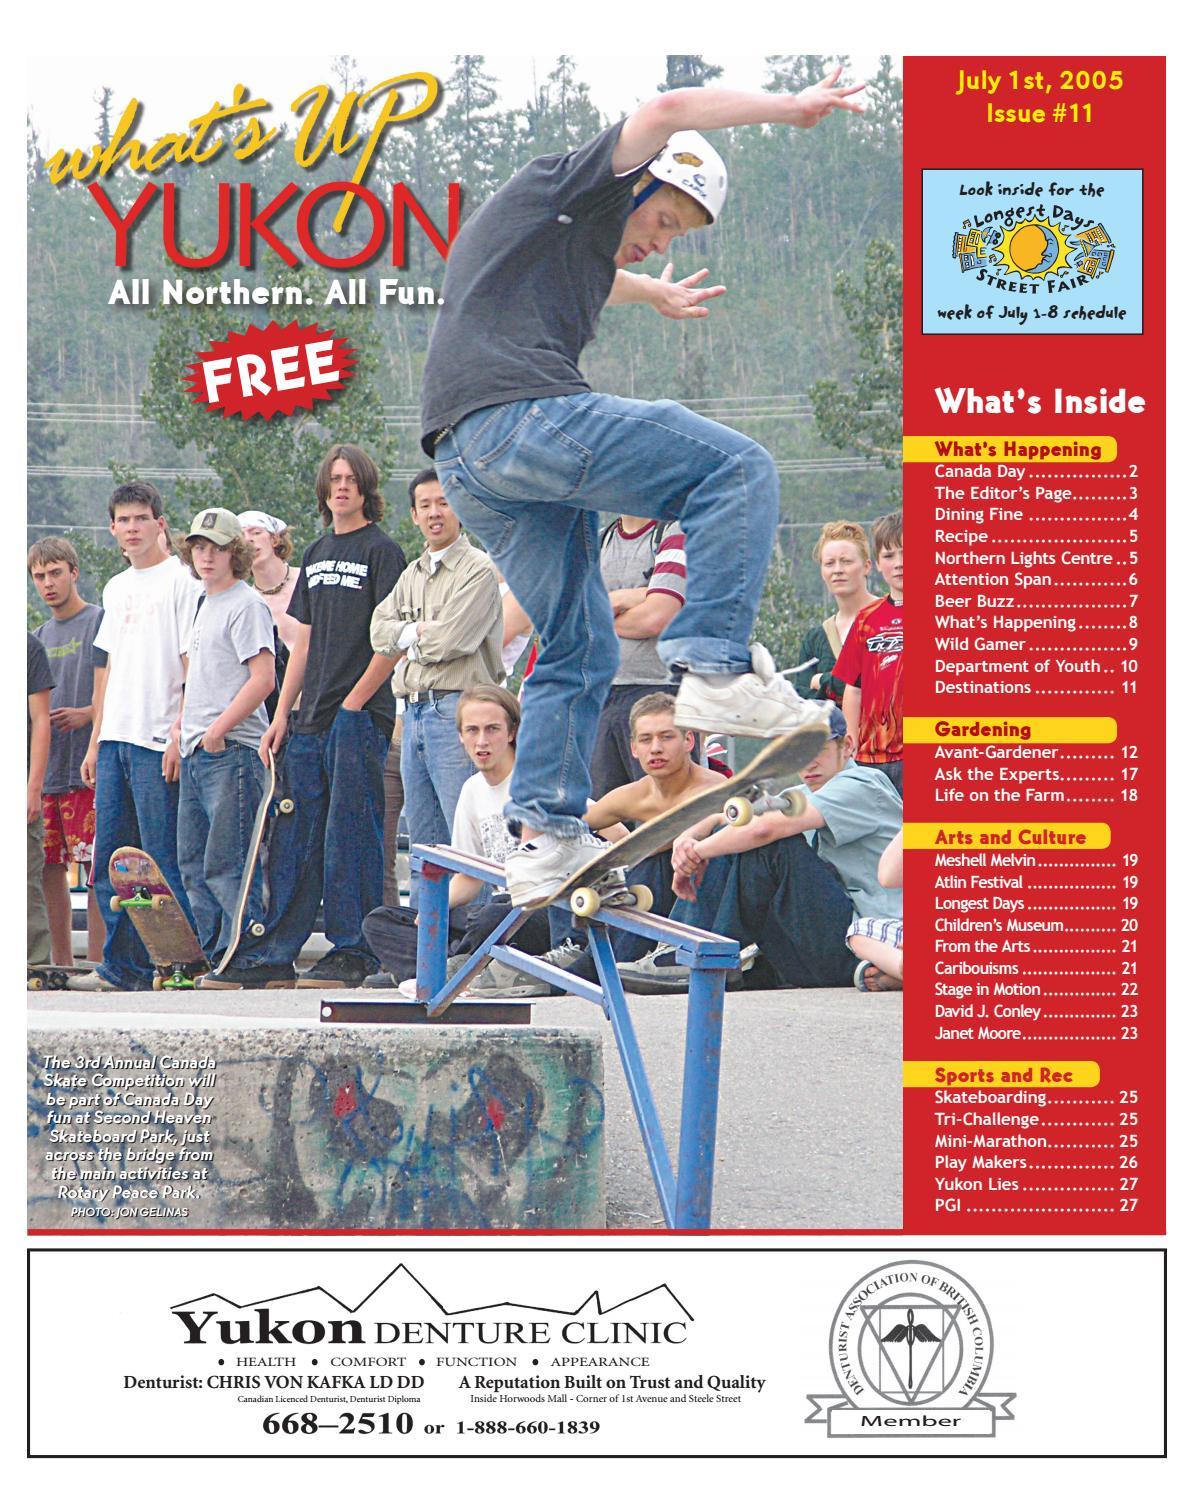 97a4d0ee796 What's Up Yukon, July 1, 2005 by What's Up Yukon - issuu